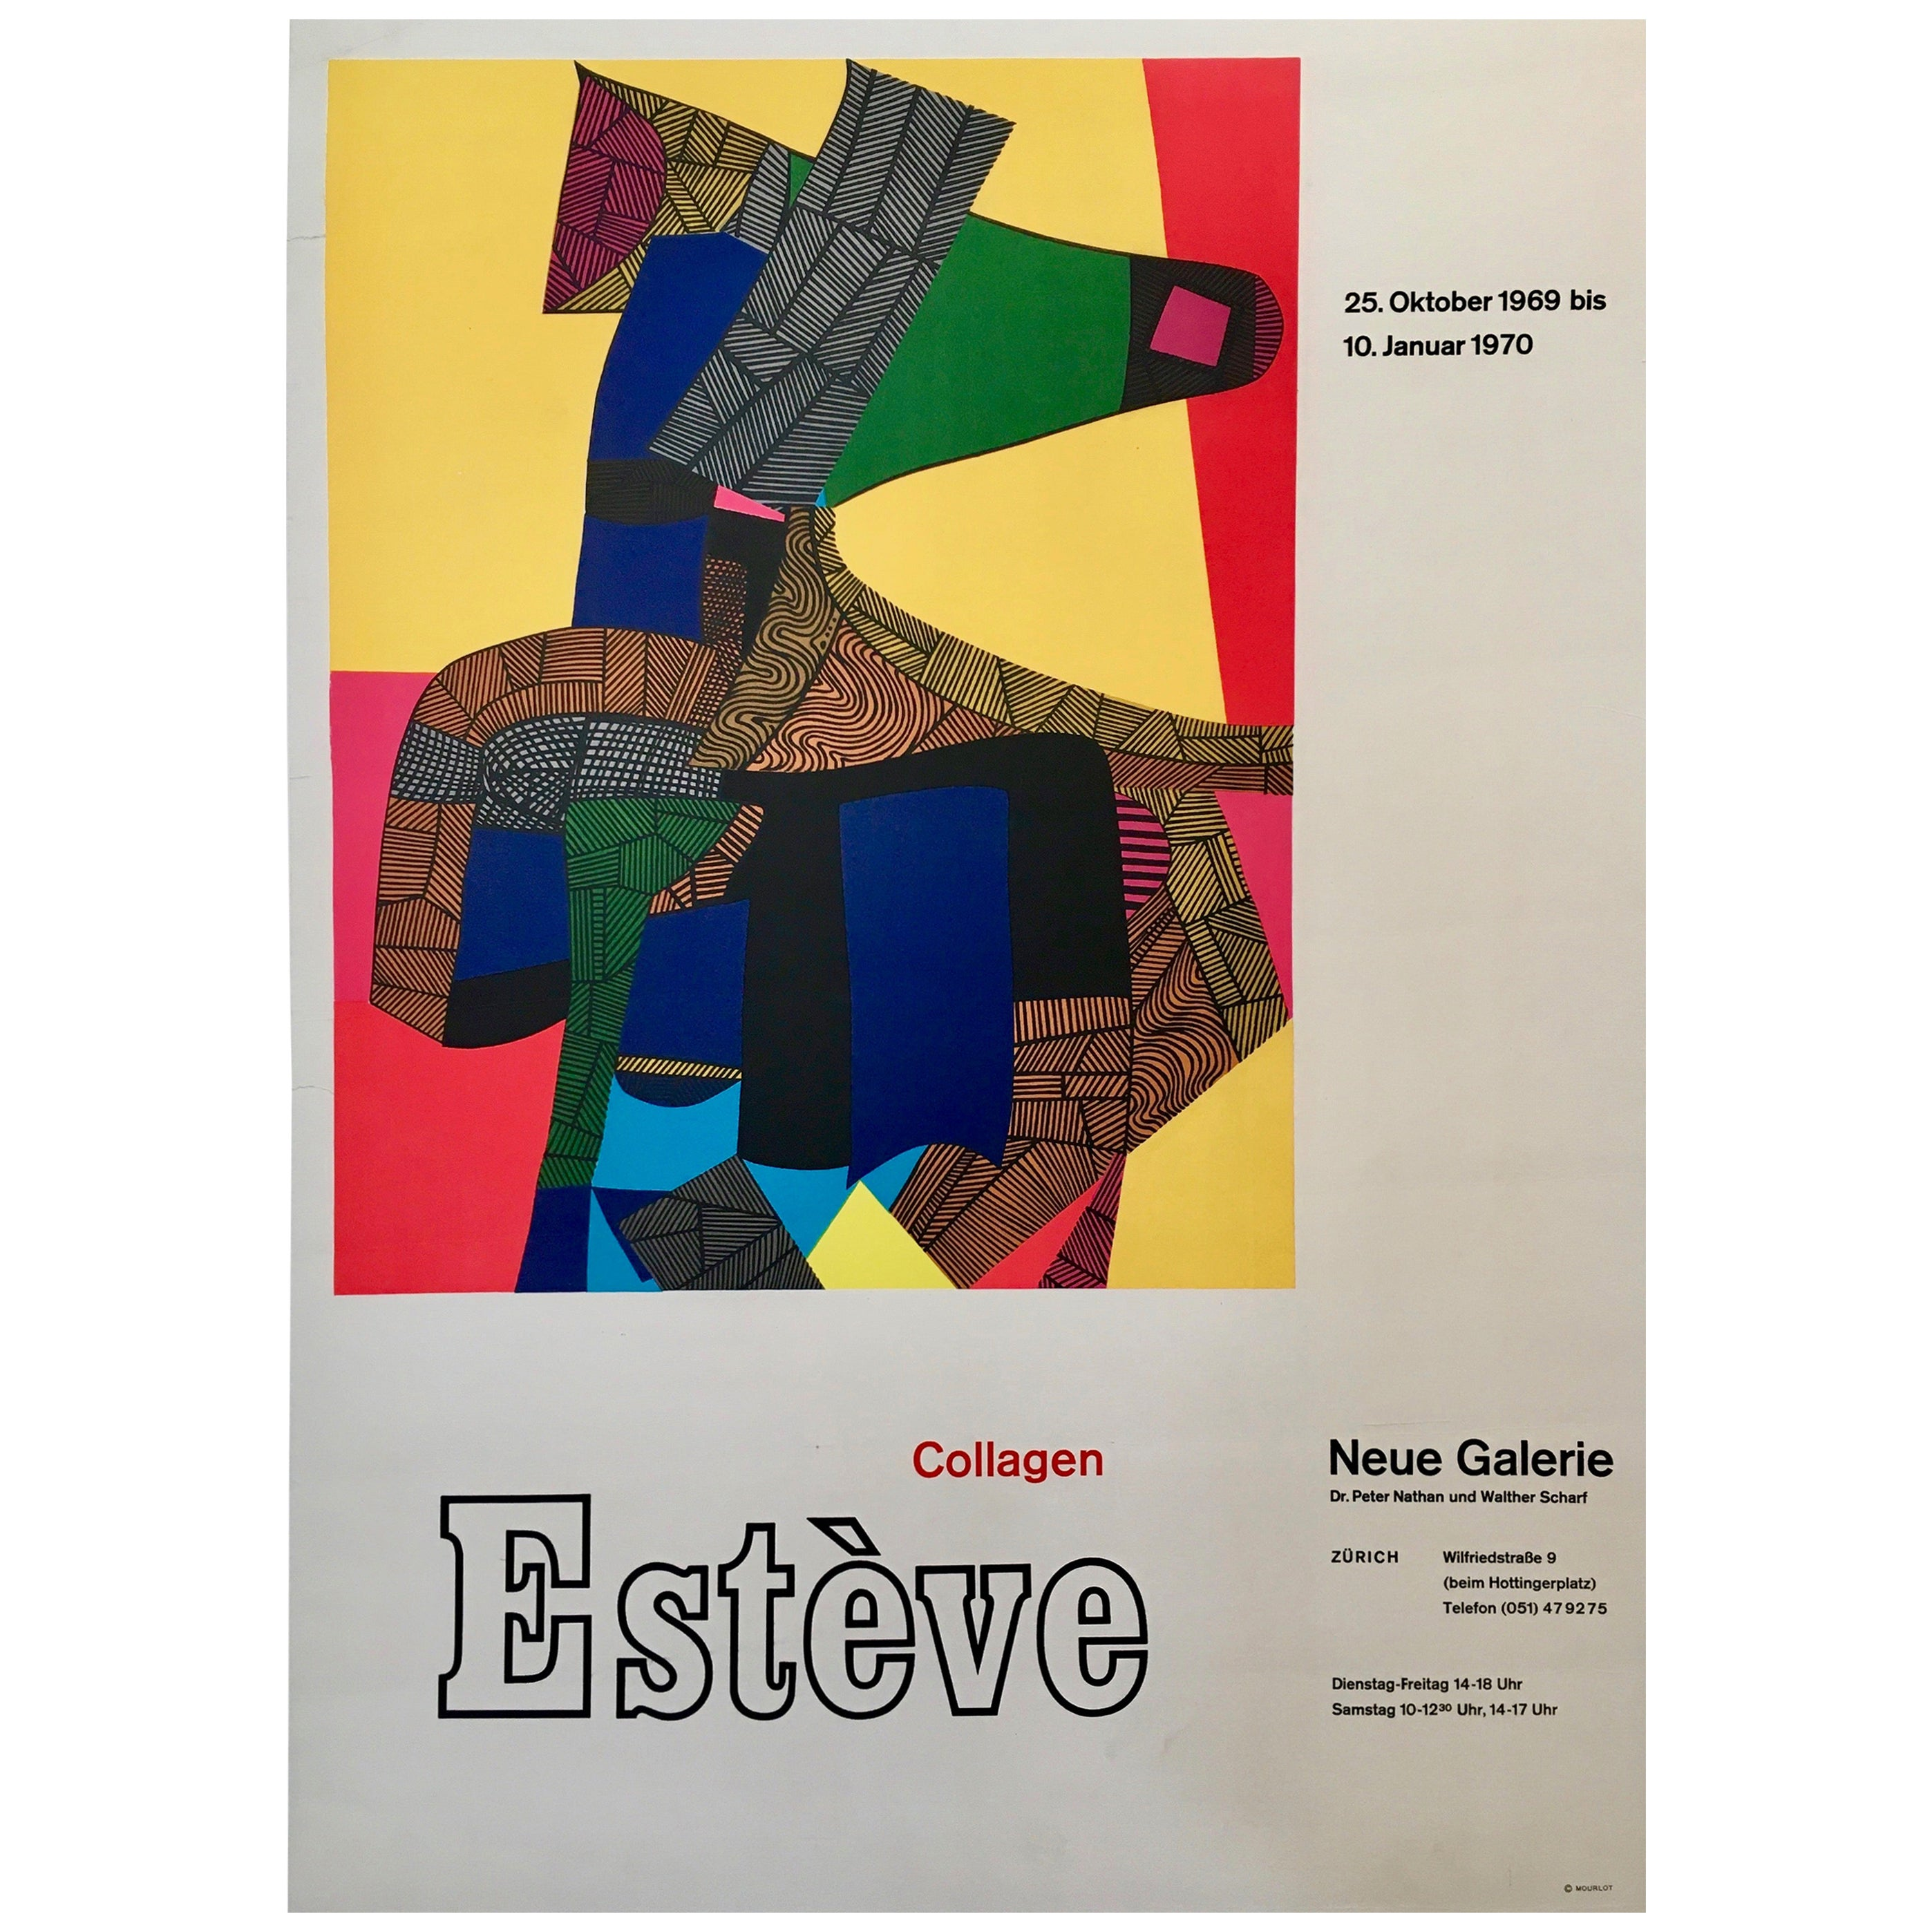 Maurice Estève Neue Galerie Exhibition Original Vintage Poster, 1970